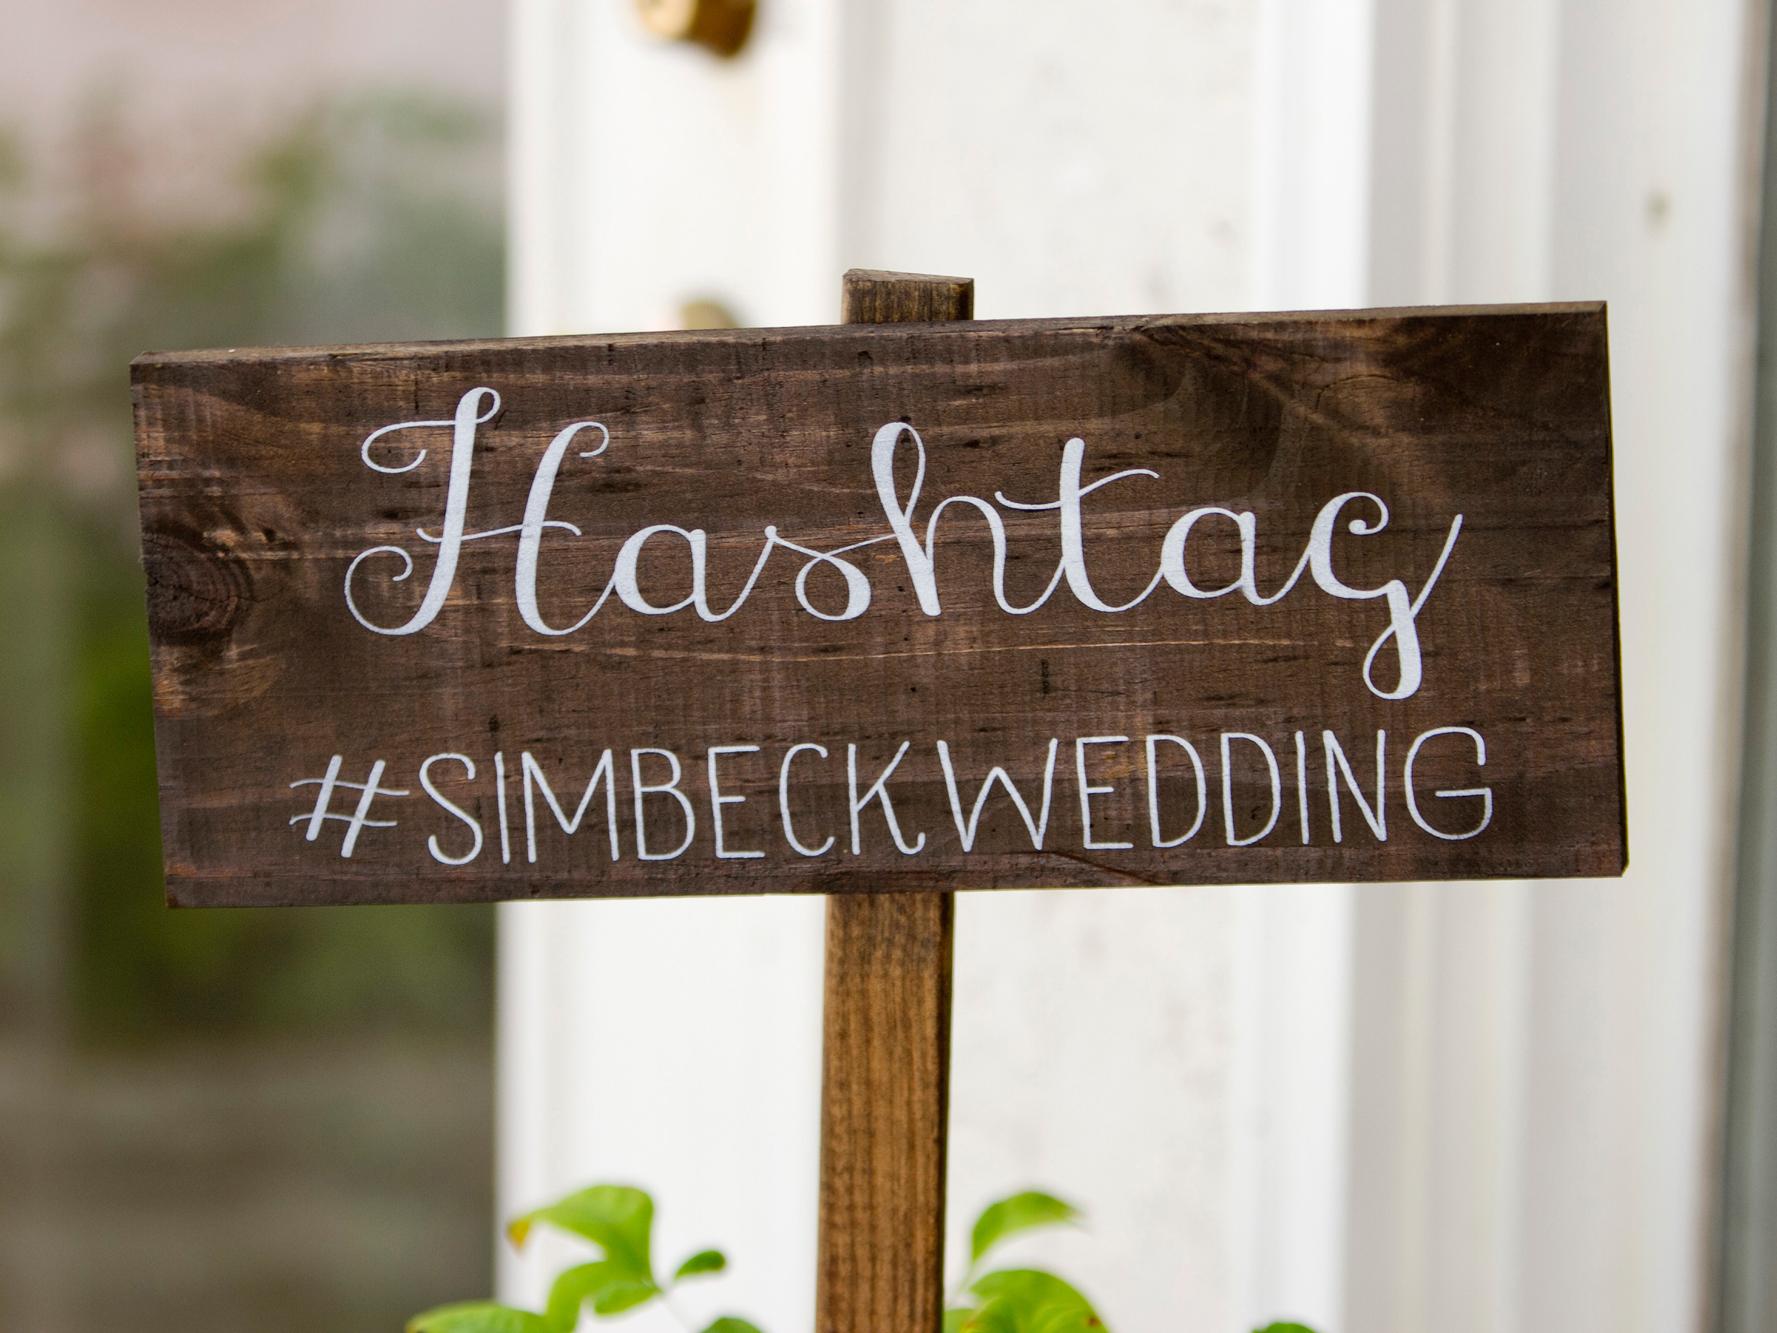 Wedding Hashtag Puns.How To Create A Wedding Hashtag Love Our Wedding